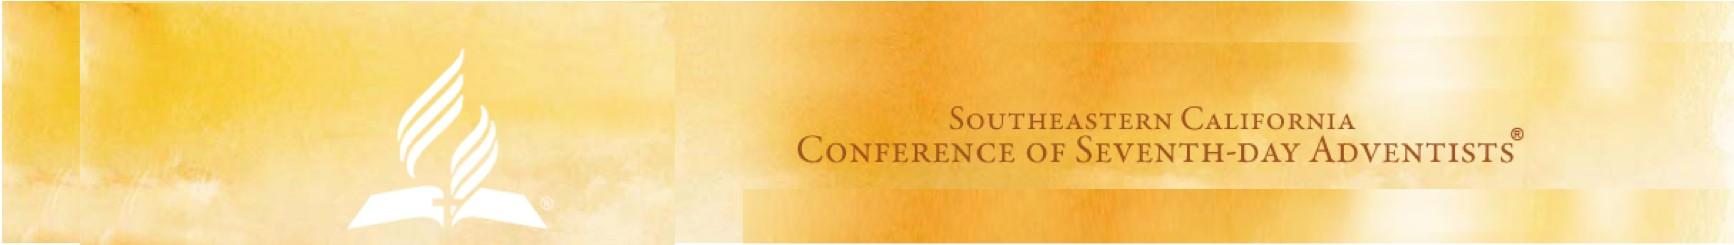 Southeastern California Conference of SDA | LinkedIn